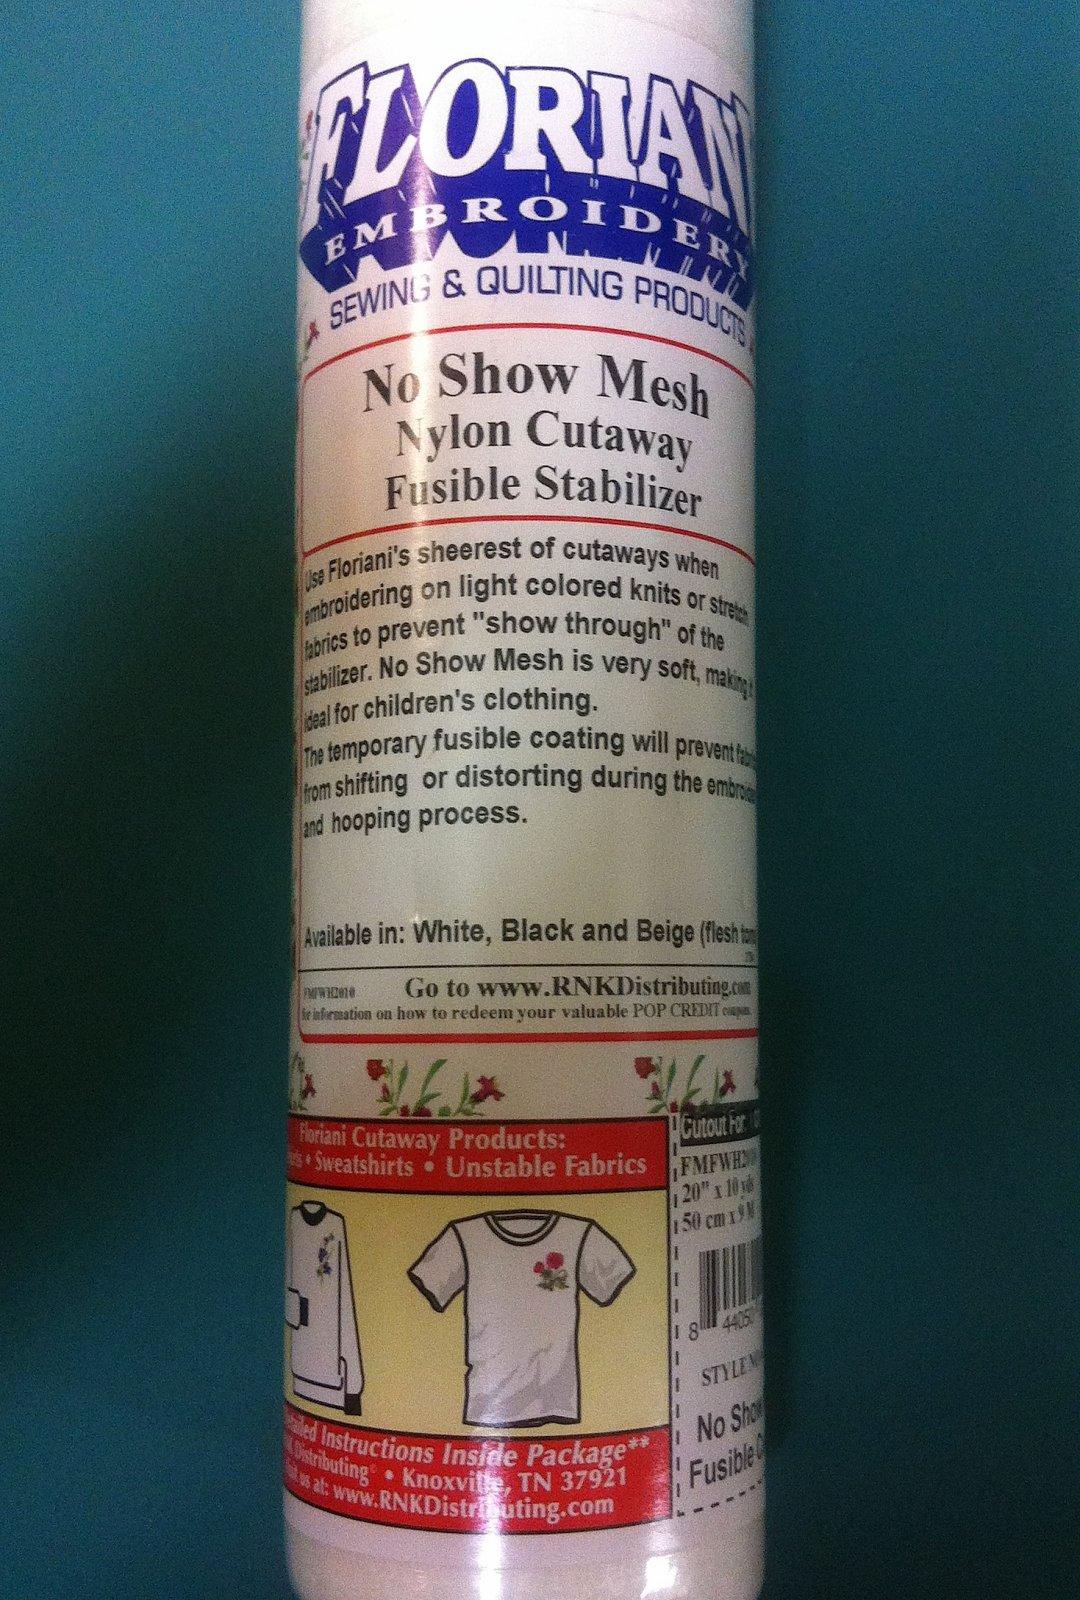 No Show Mesh Nylon Cutaway Roll 20 X 10 yds